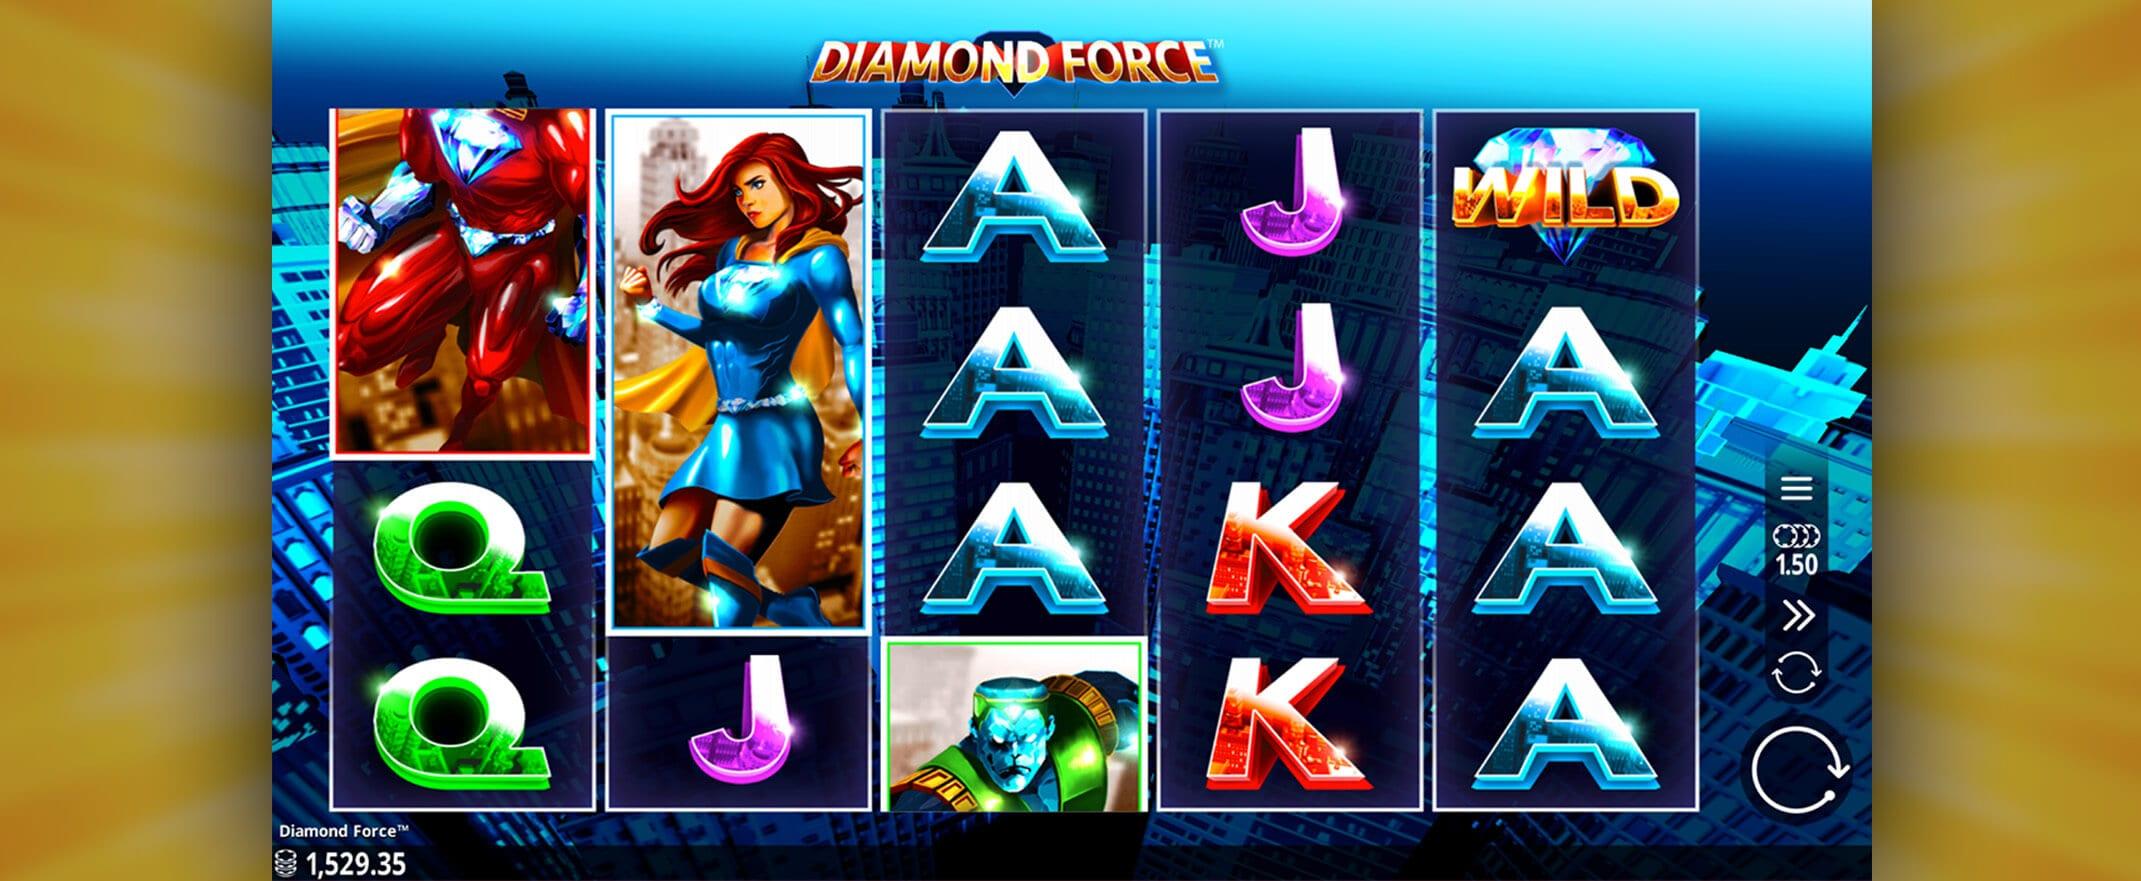 Diamond Force Online Slots